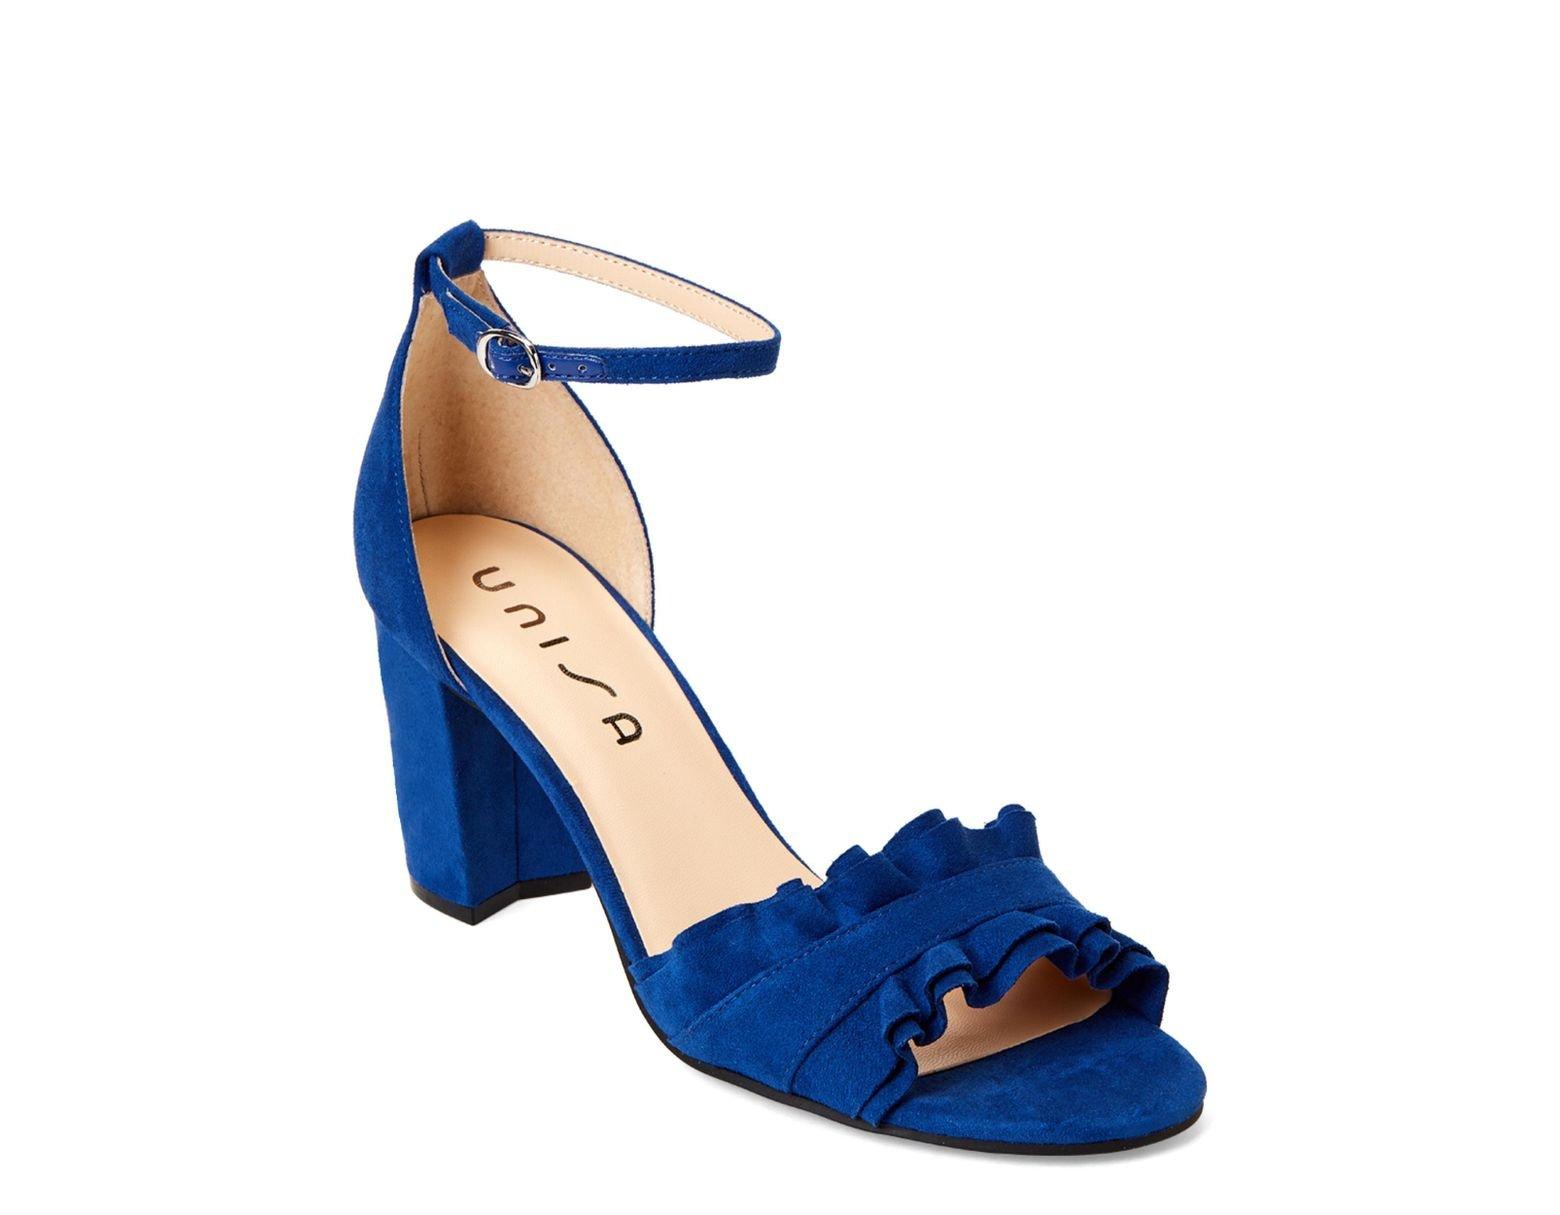 e7632f2e60 Unisa Royal Blue Danni Ruffle Ankle Strap Sandals in Blue - Lyst